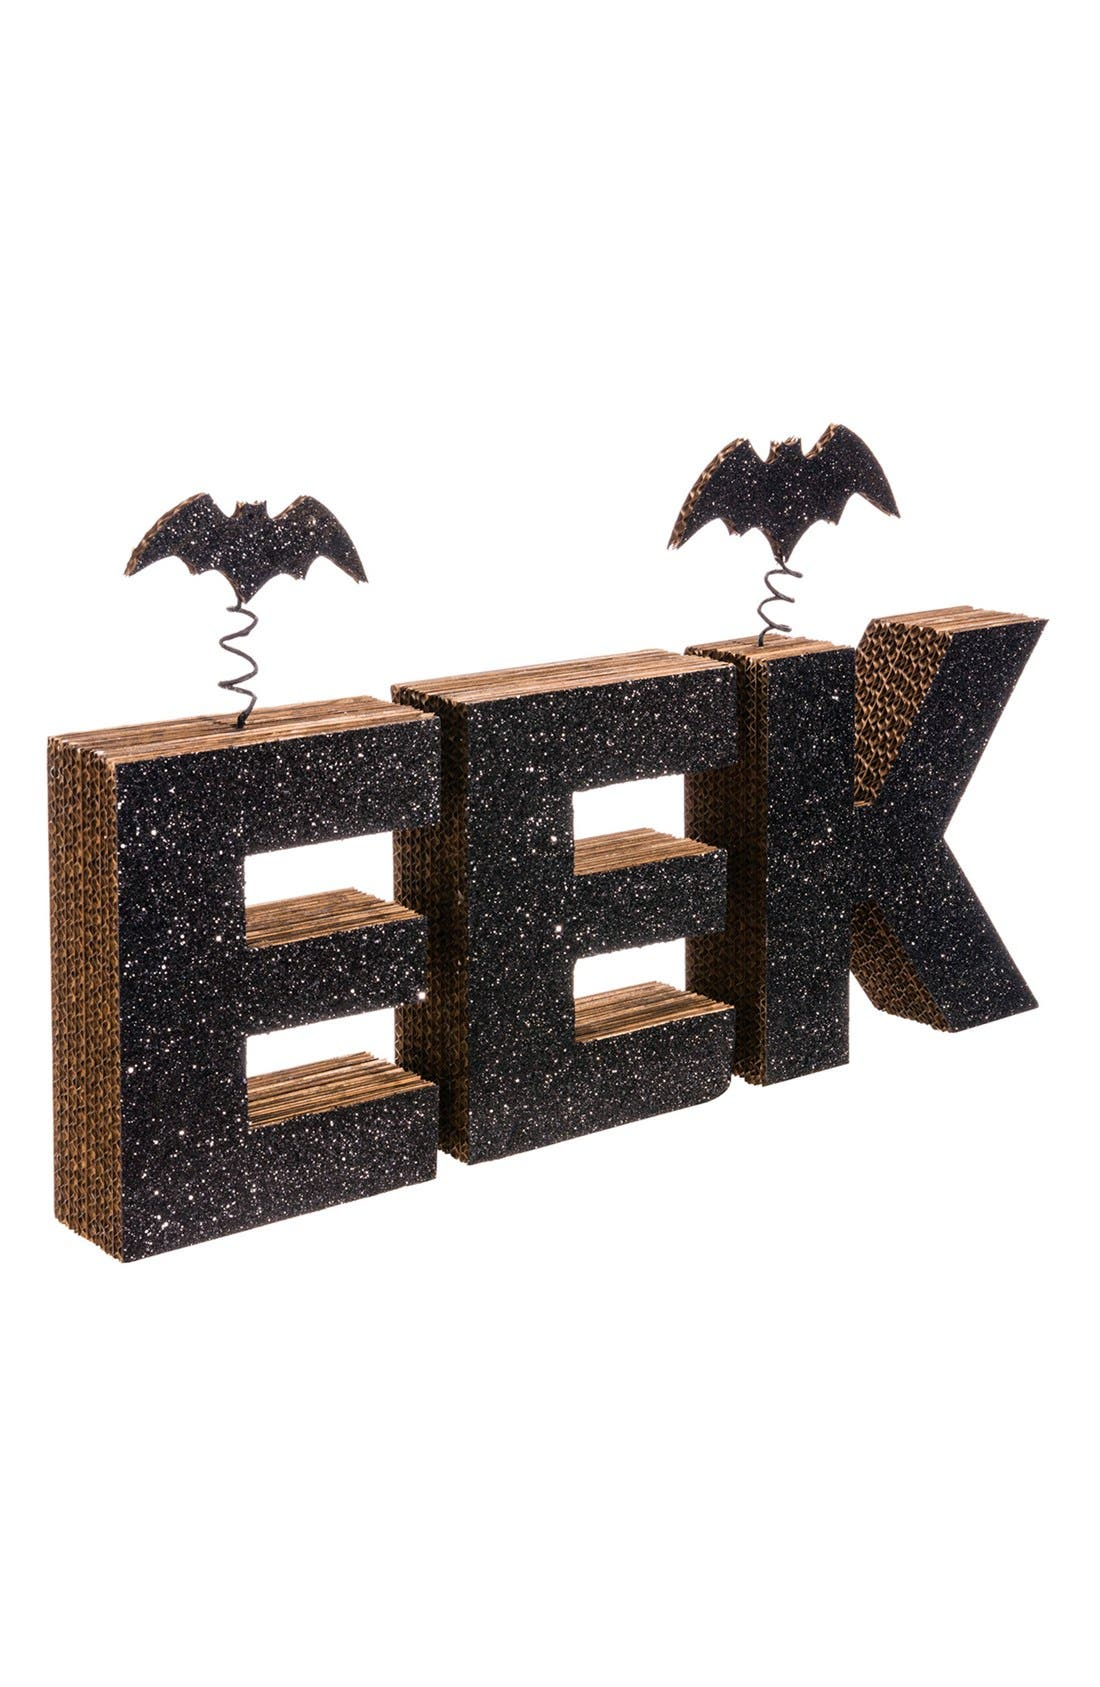 Main Image - ALLSTATE 'Eek' Bat Decoration